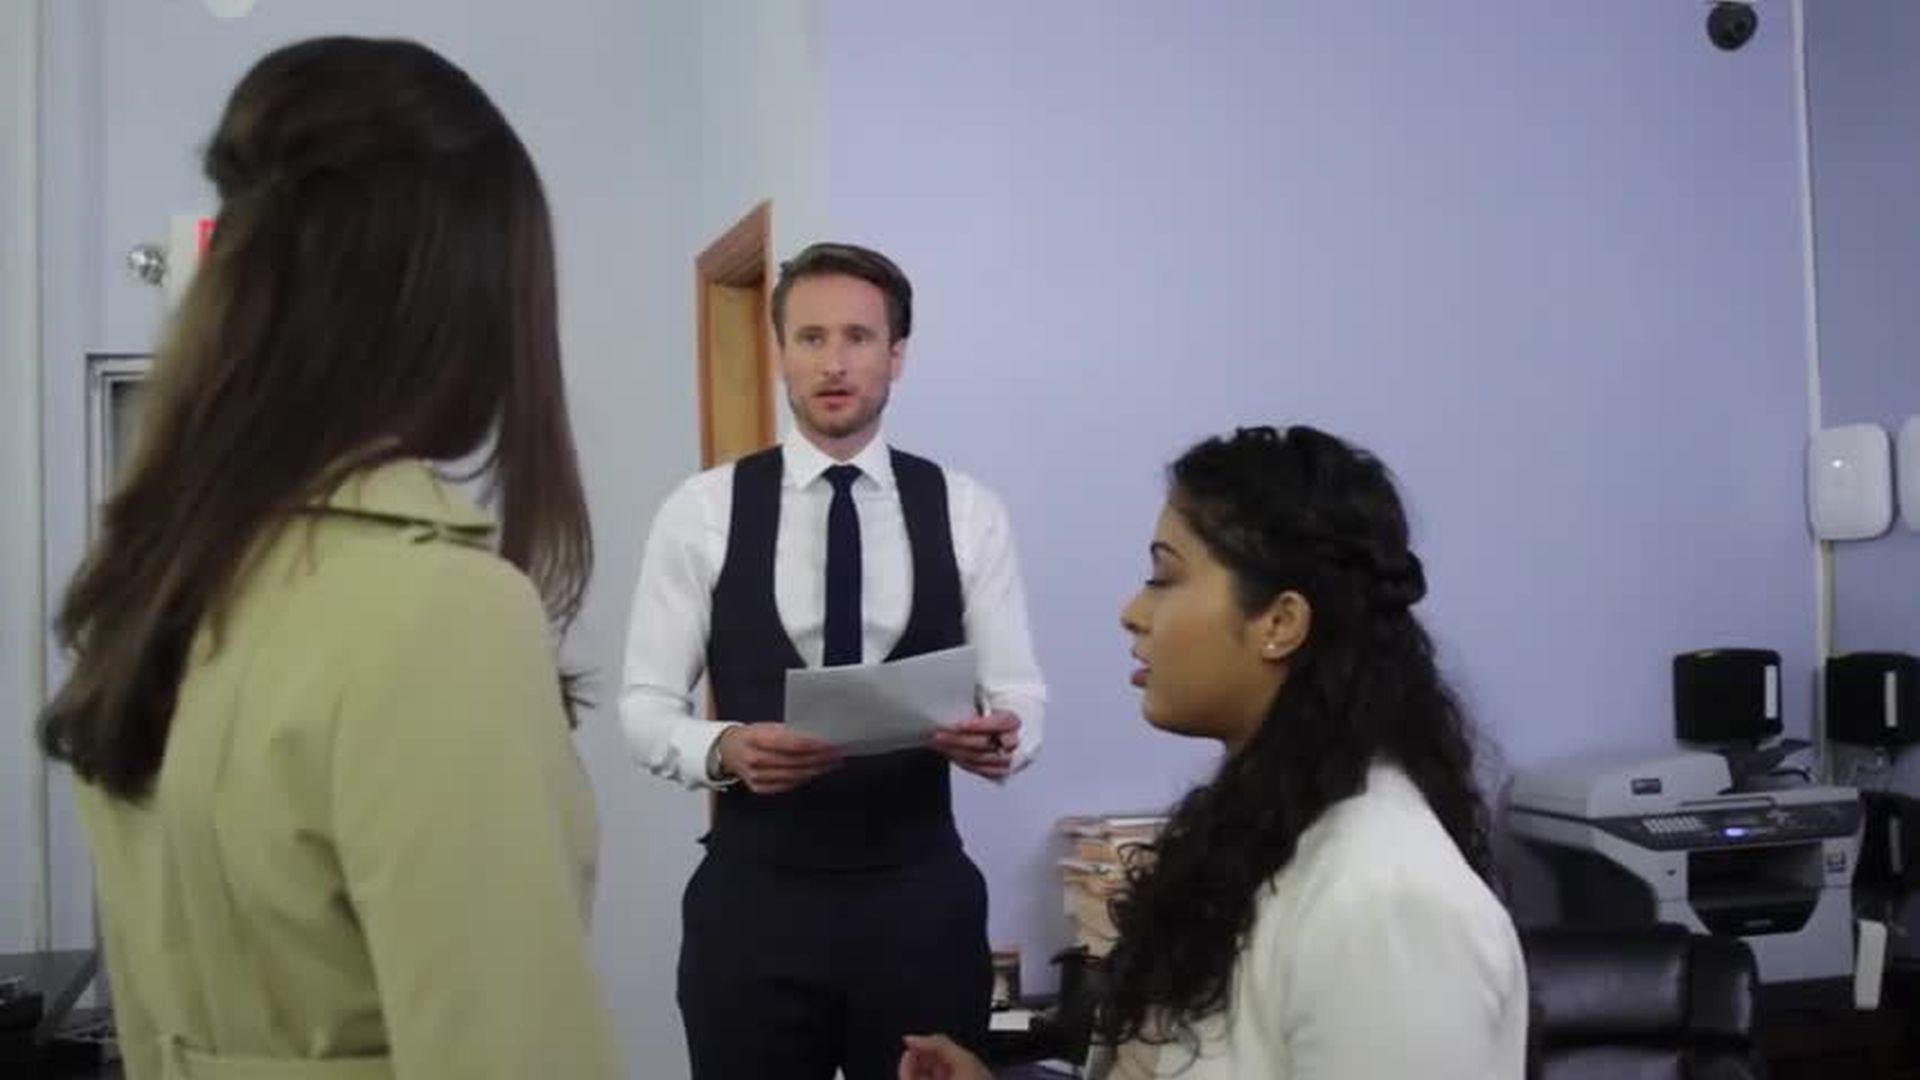 TAKE TWO - Episode 2:  He Was Slovenian Not Slovakian!